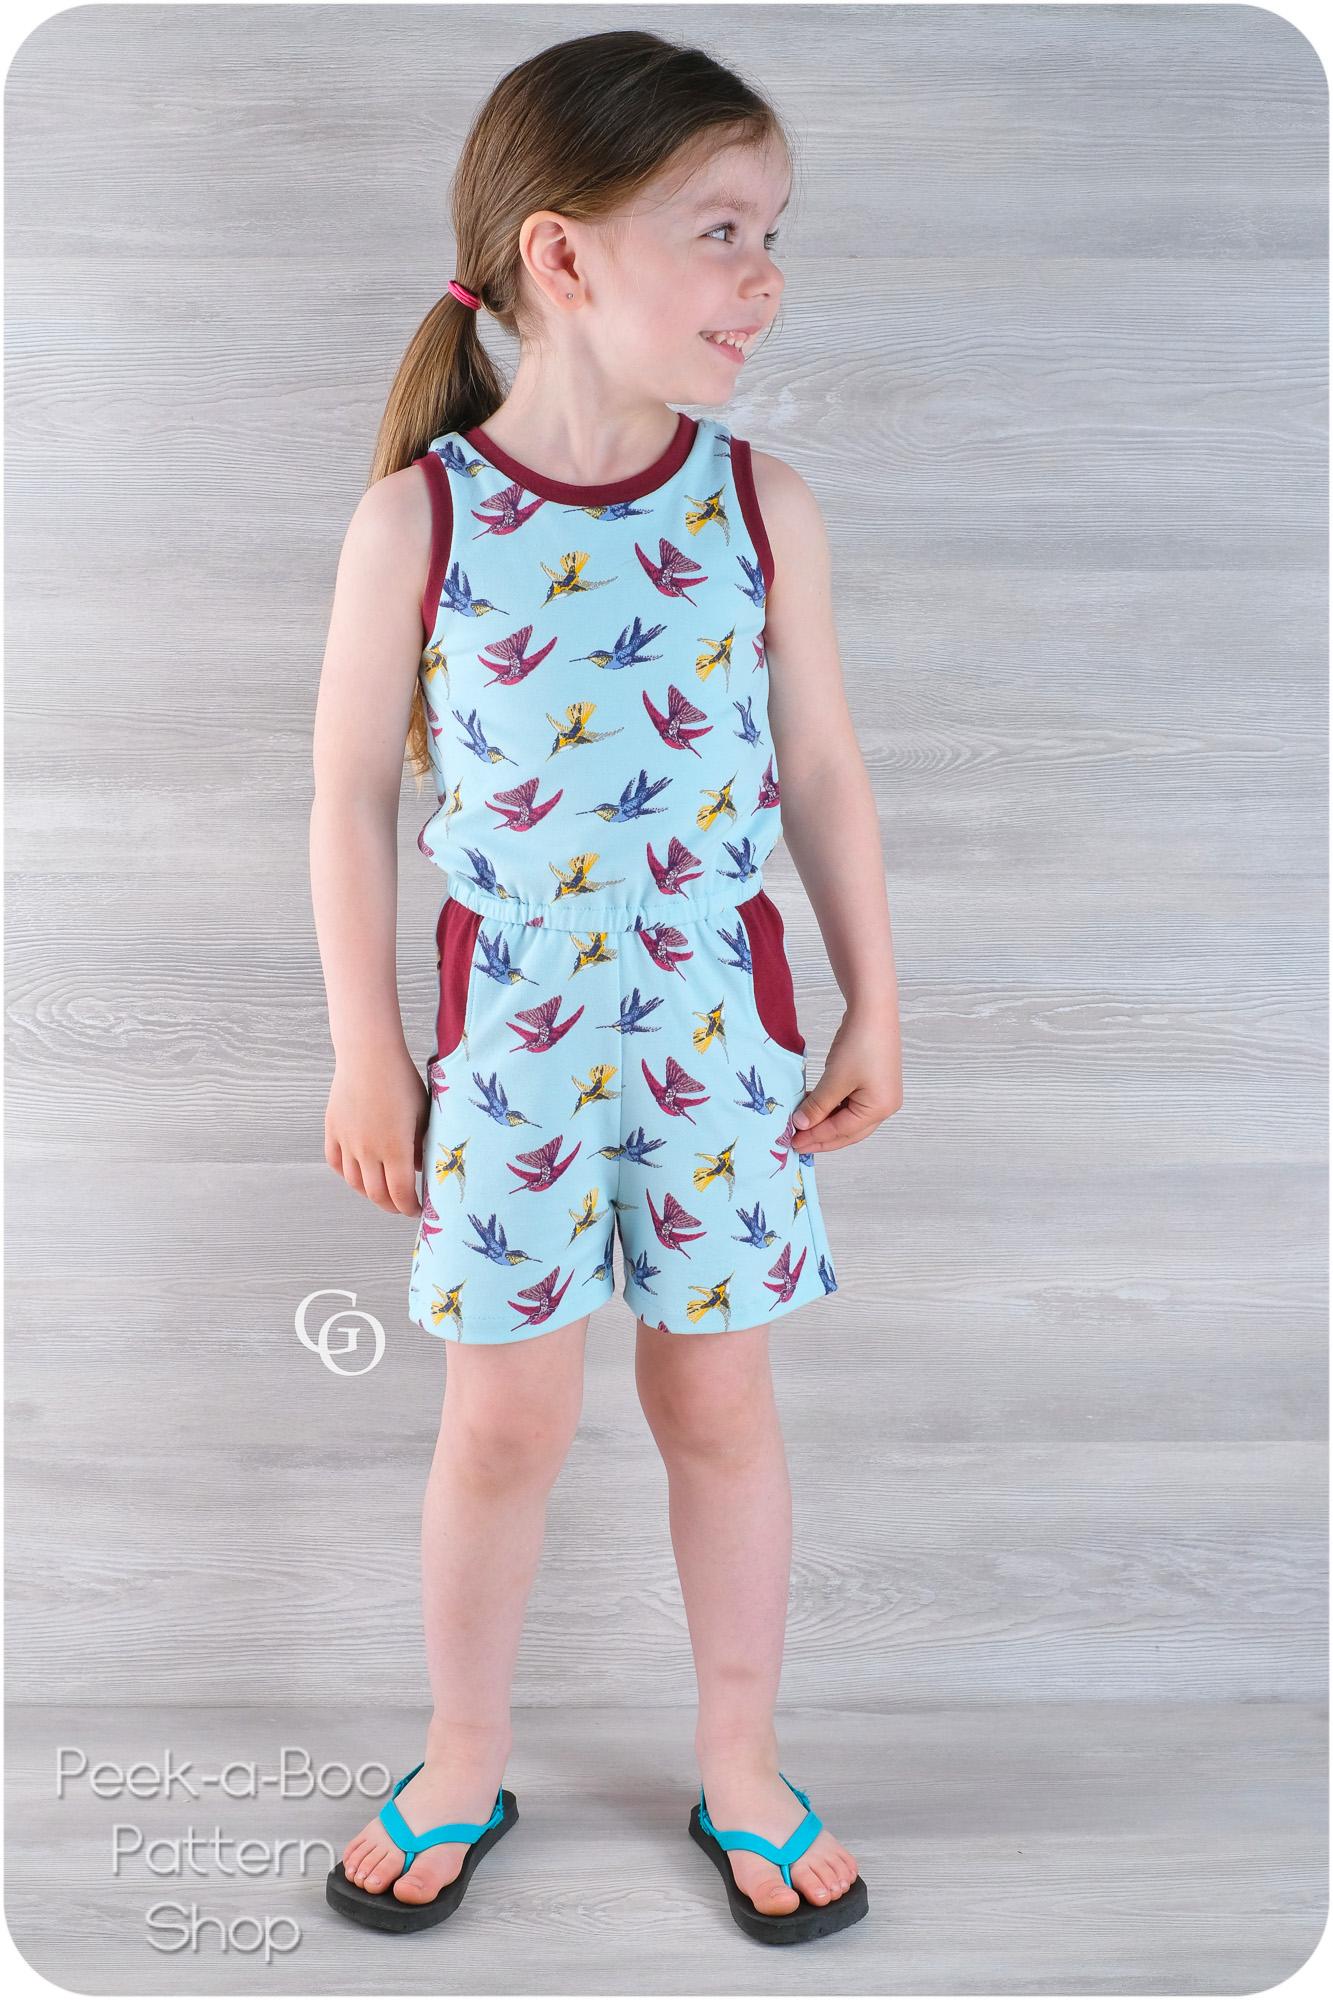 Harlow Dress and Romper